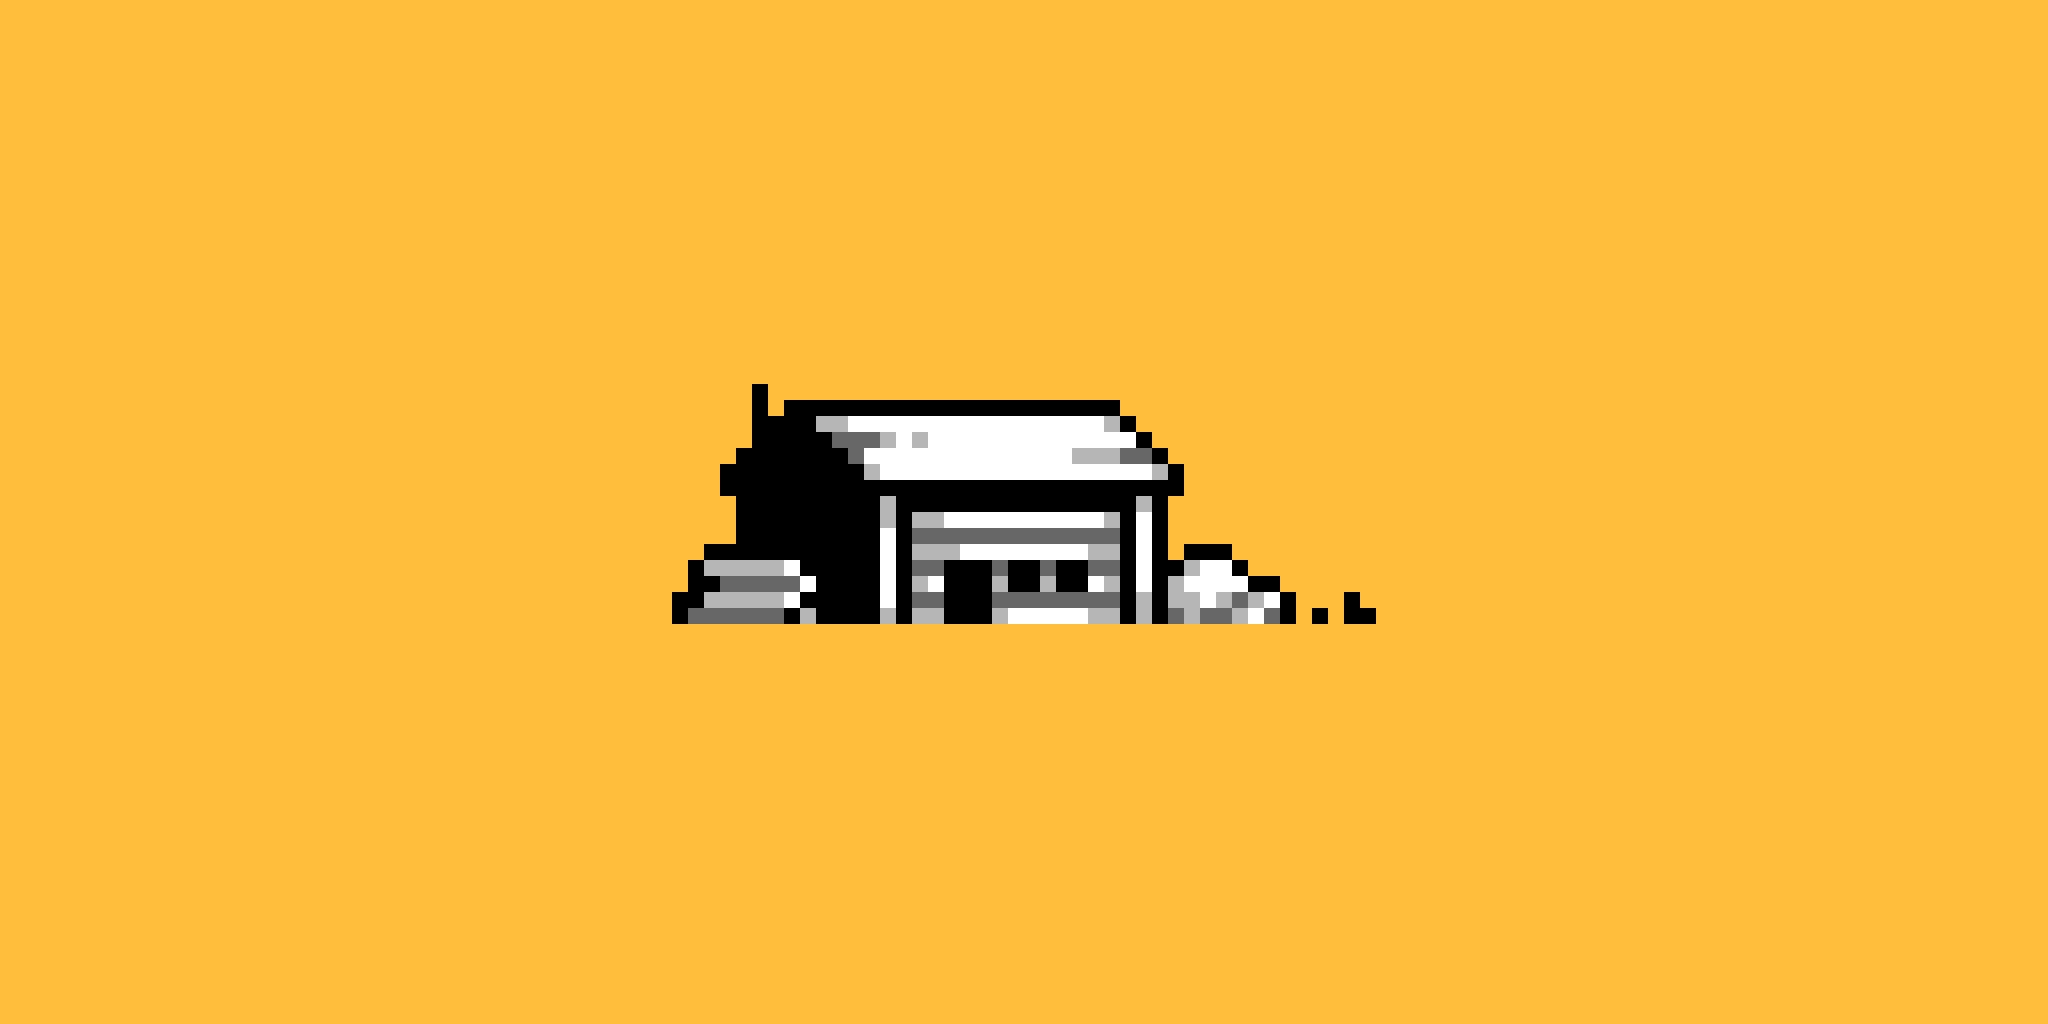 monochrome_house1.jpg